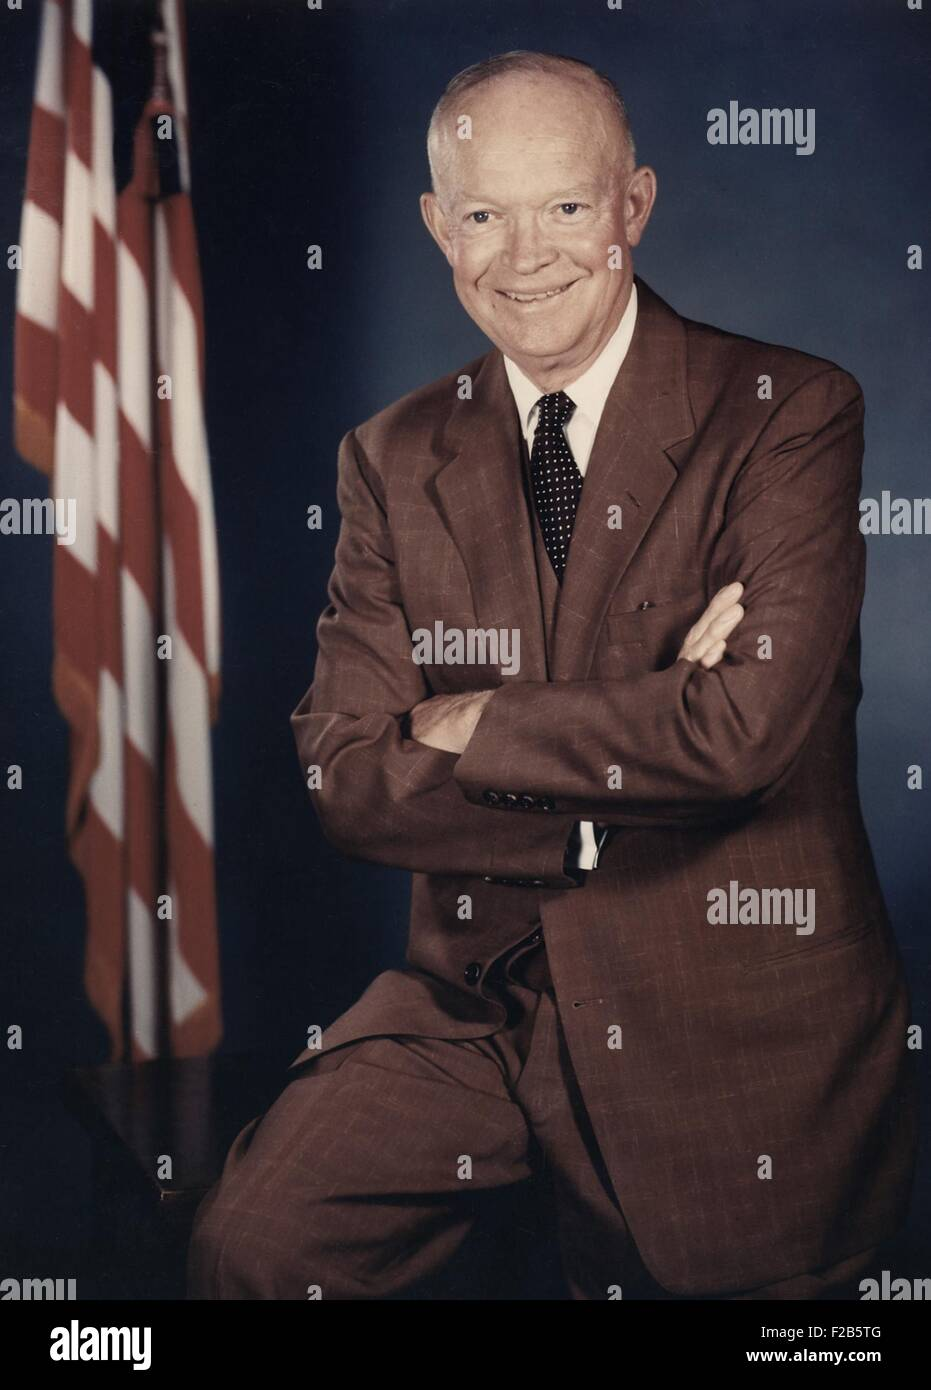 President Dwight Eisenhower. 1956 color portrait. - (BSLOC 2014 16 53) Stock Photo